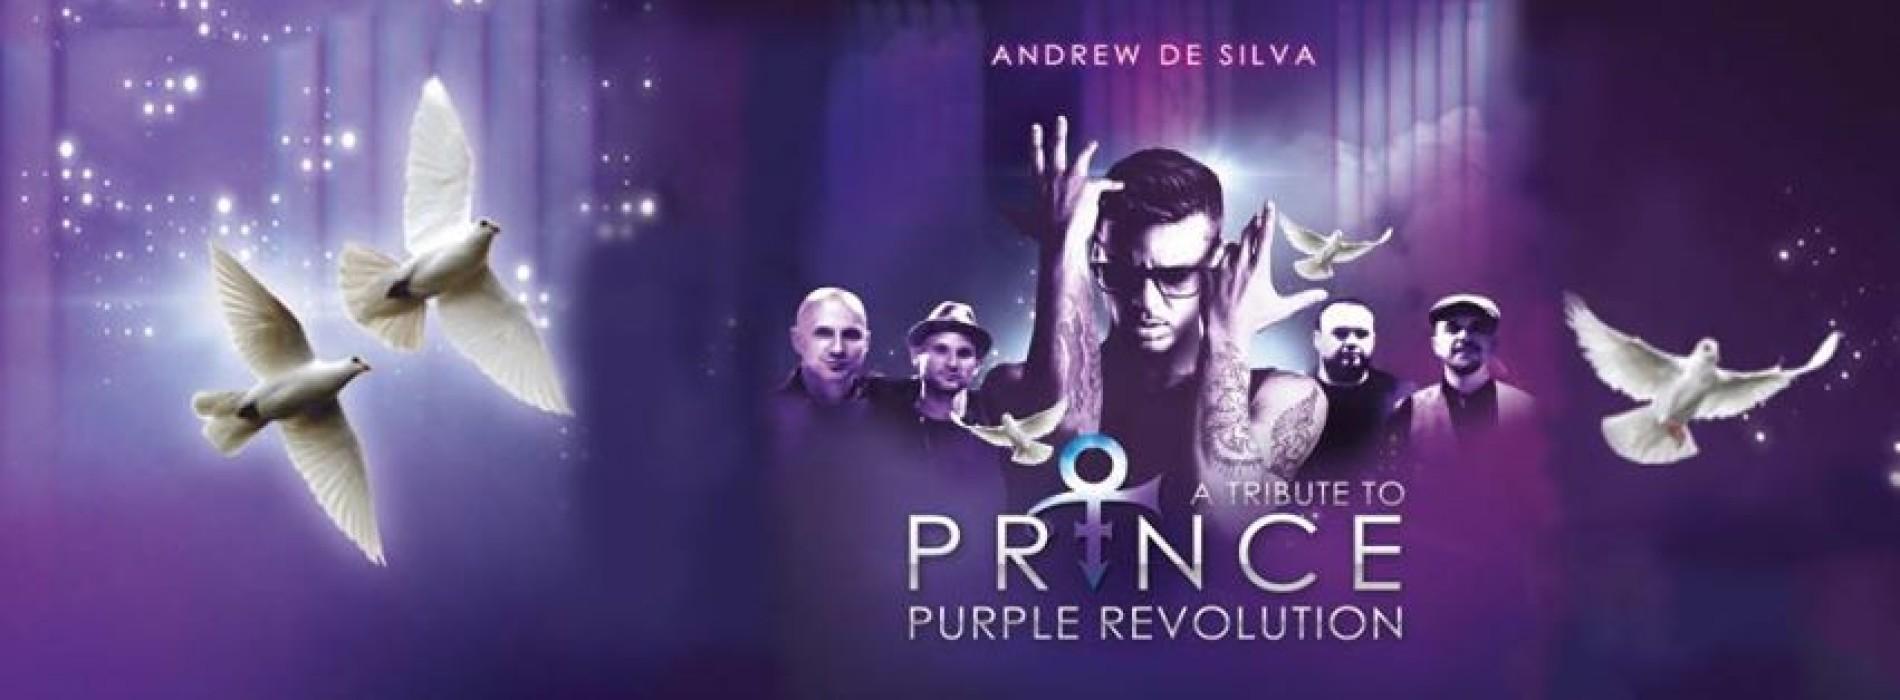 Purple Revolution Has Gotten A Date